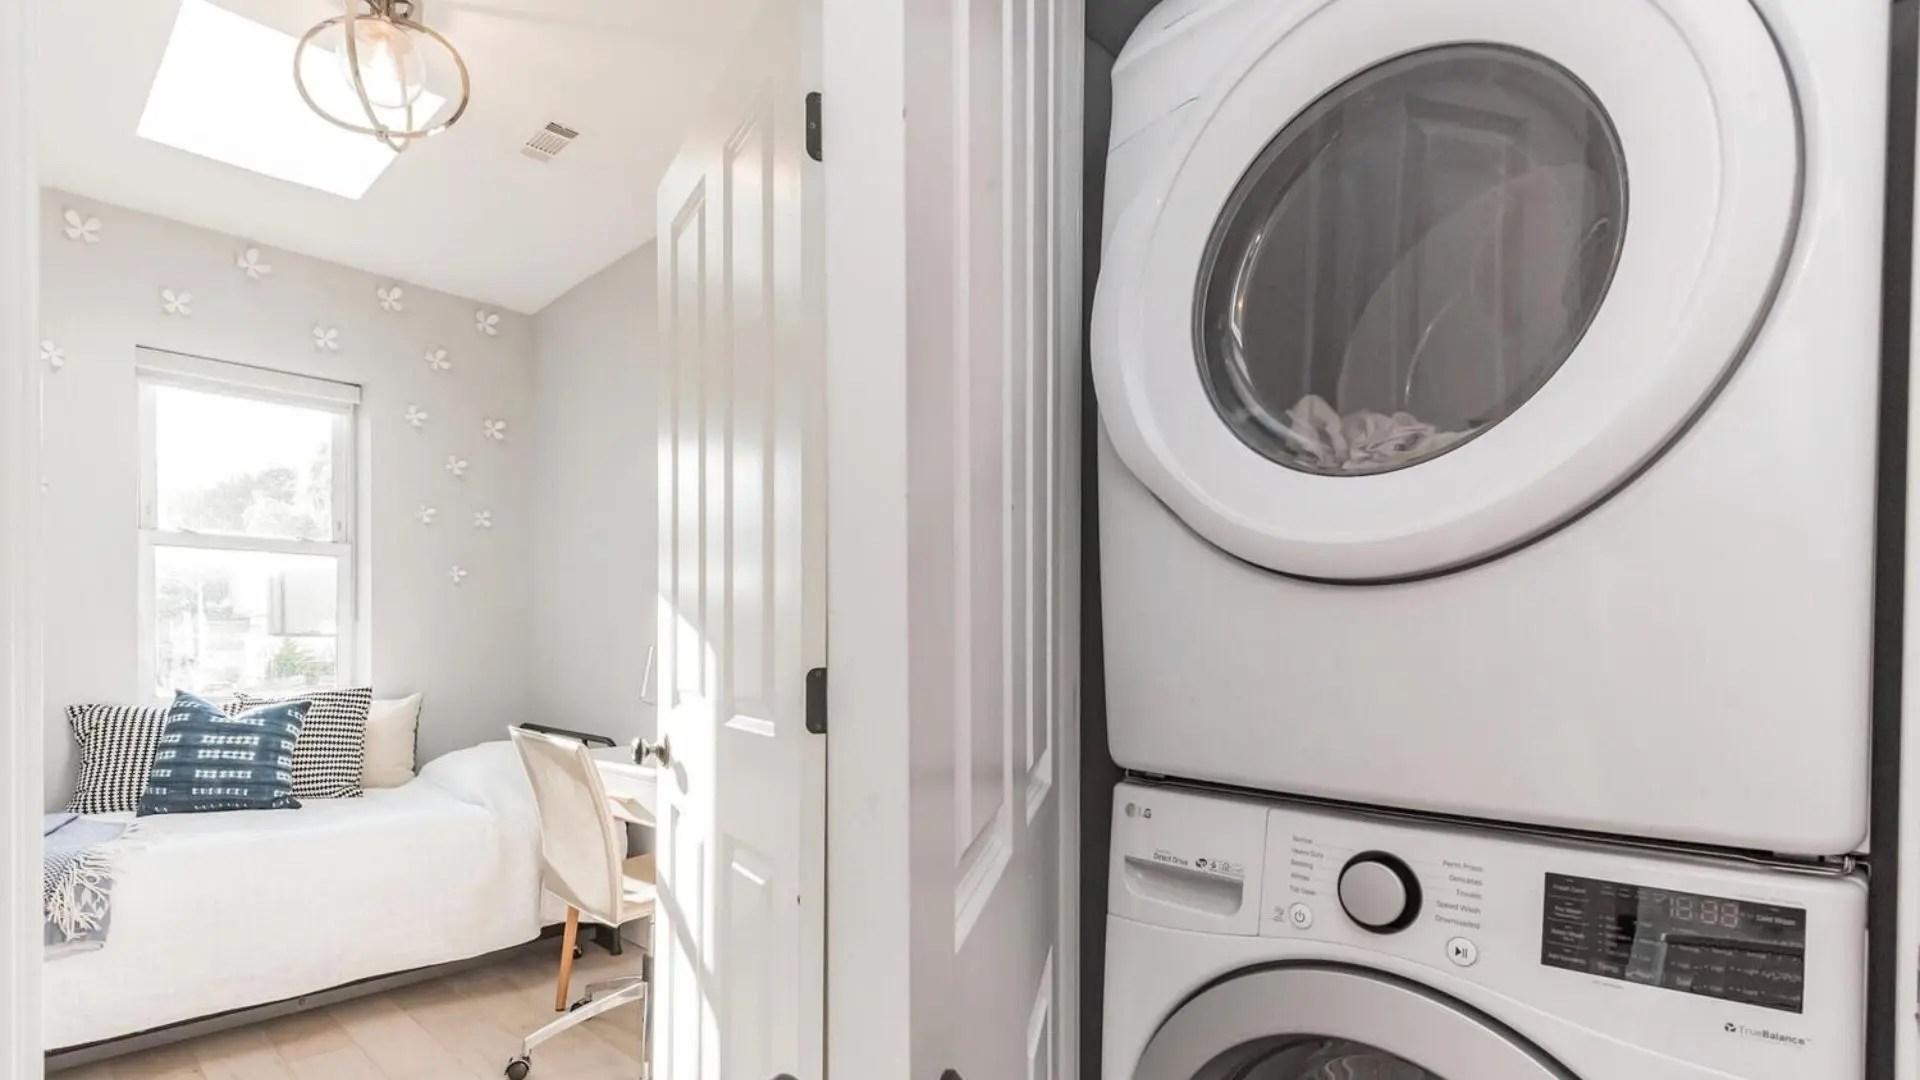 680-4th-bd-laundryctr